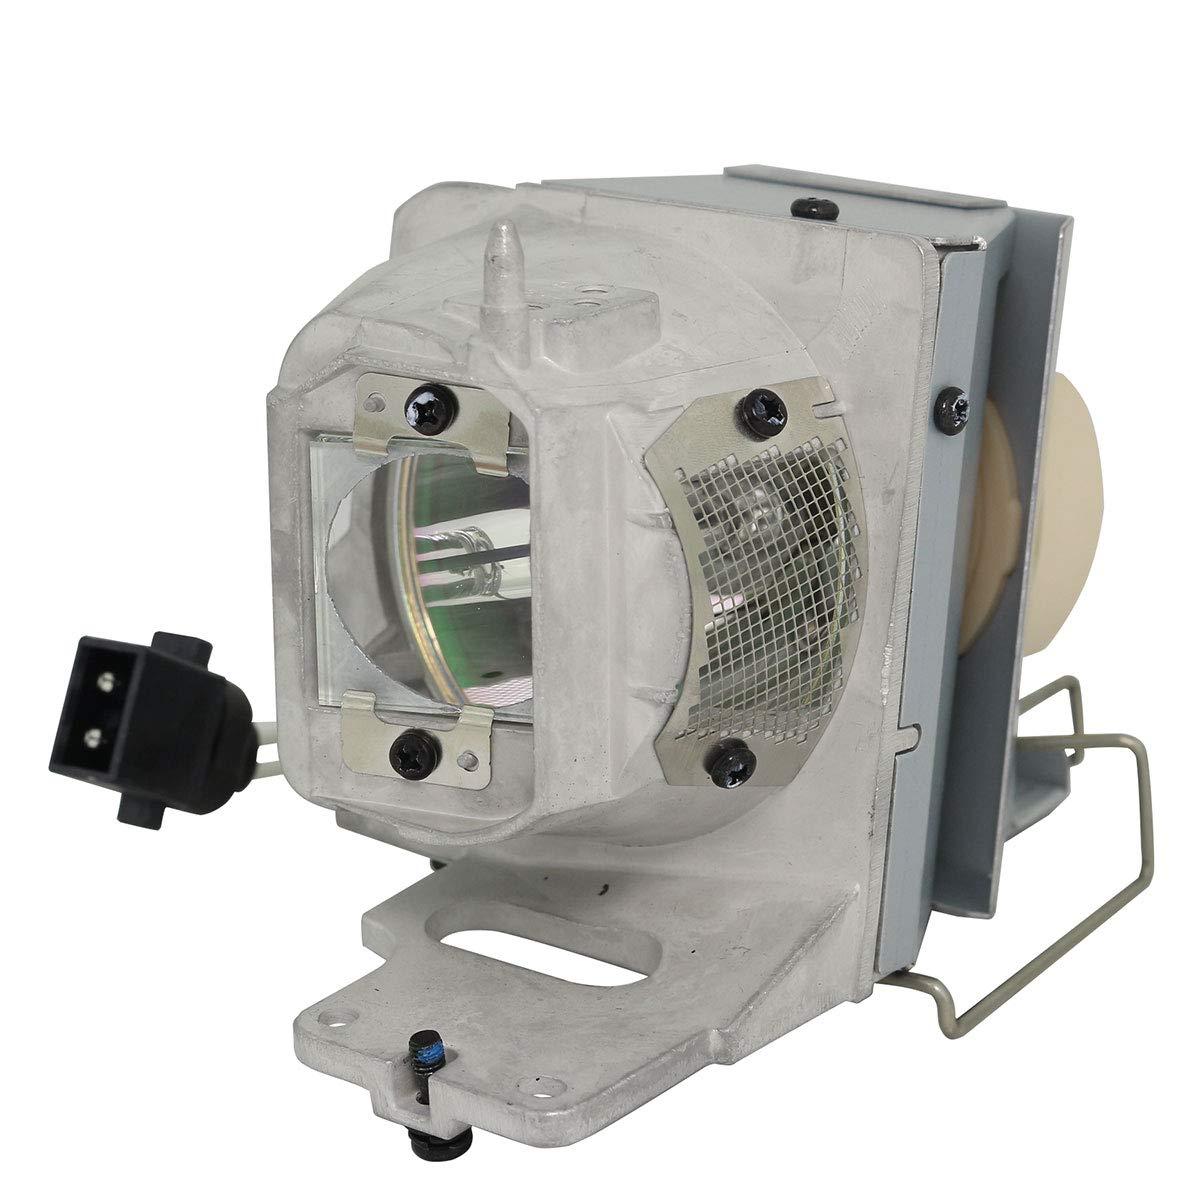 SpArc プロジェクター交換用ランプ 囲い/電球付き Optoma WU334用 Economy Economy Lamp with Housing B07MC5N91V